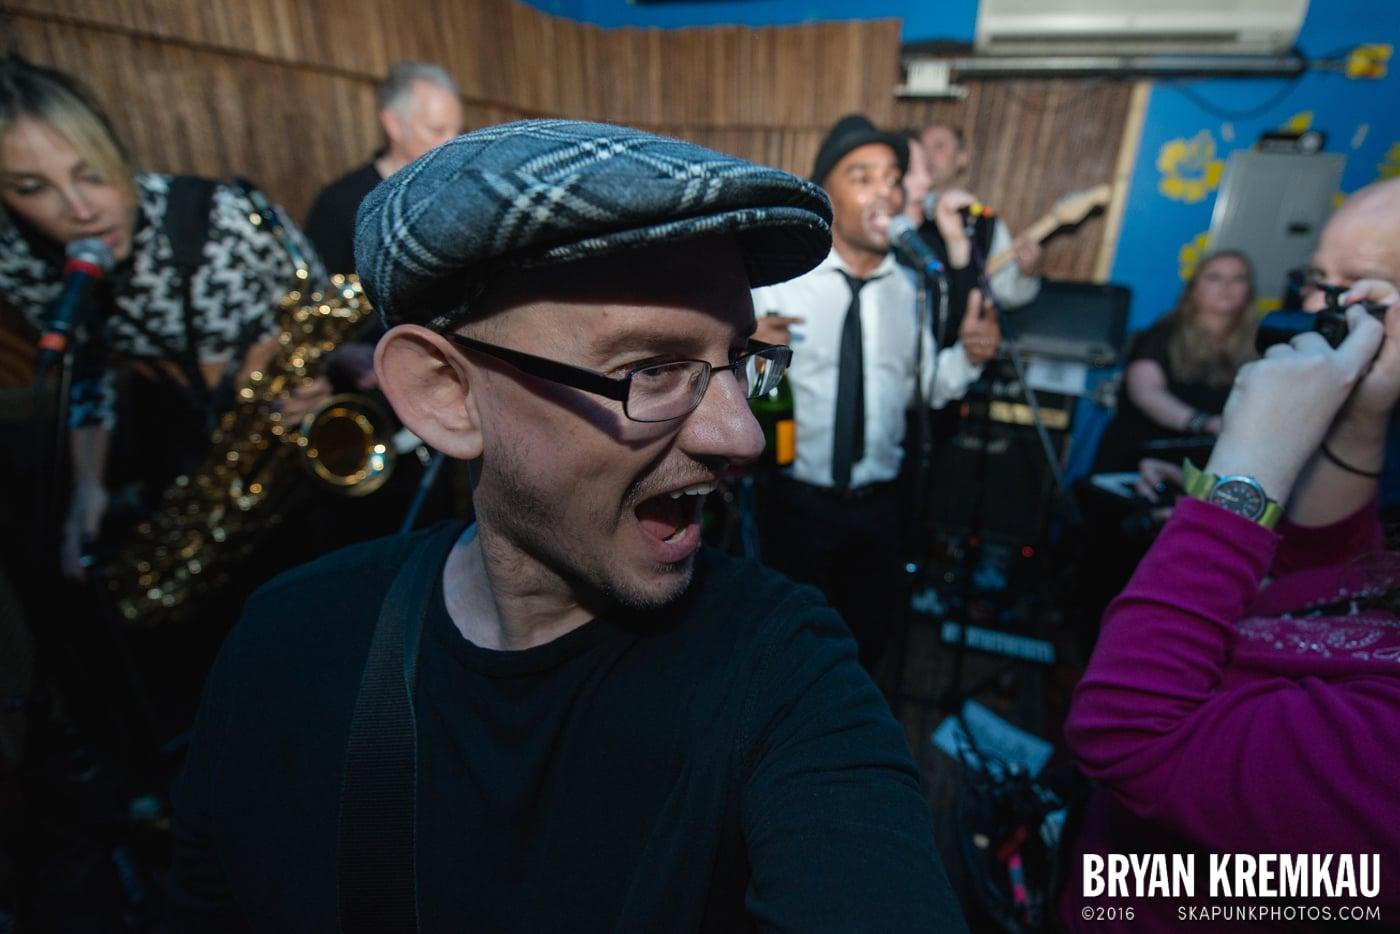 Rude Boy George @ Otto's Shrunken Head, NYC - 12.5.14 (16)